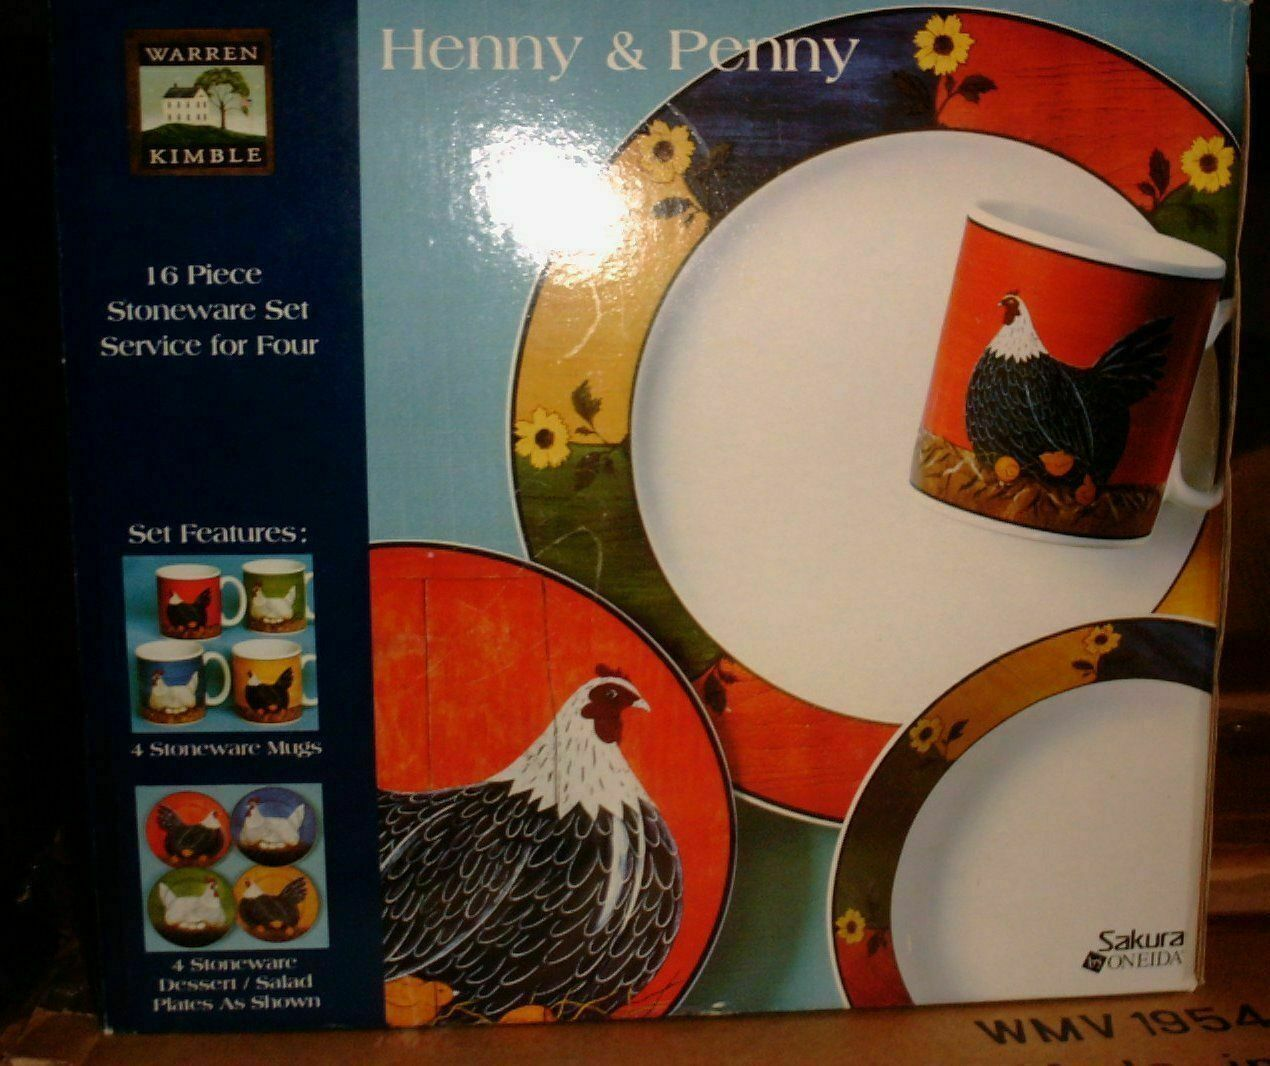 Warren Kimble HENNY PENNY 16 pc Dinnerware Set - Rare  BNIB